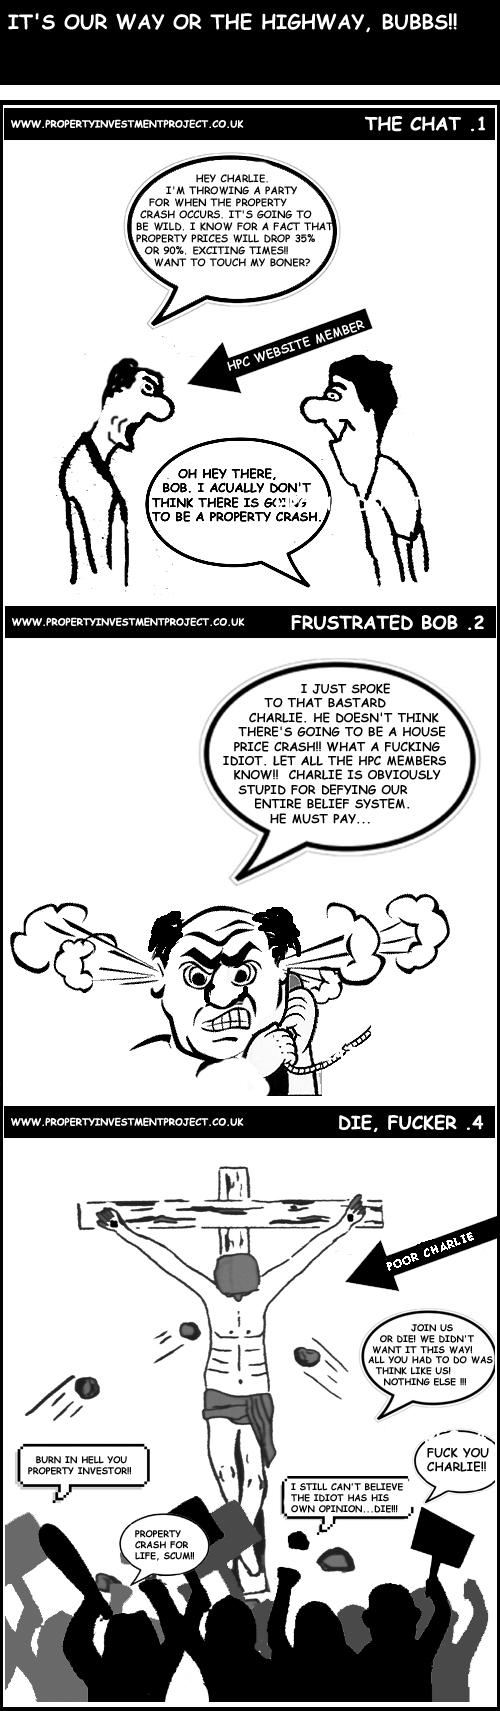 House Price Crash Mentality Comic